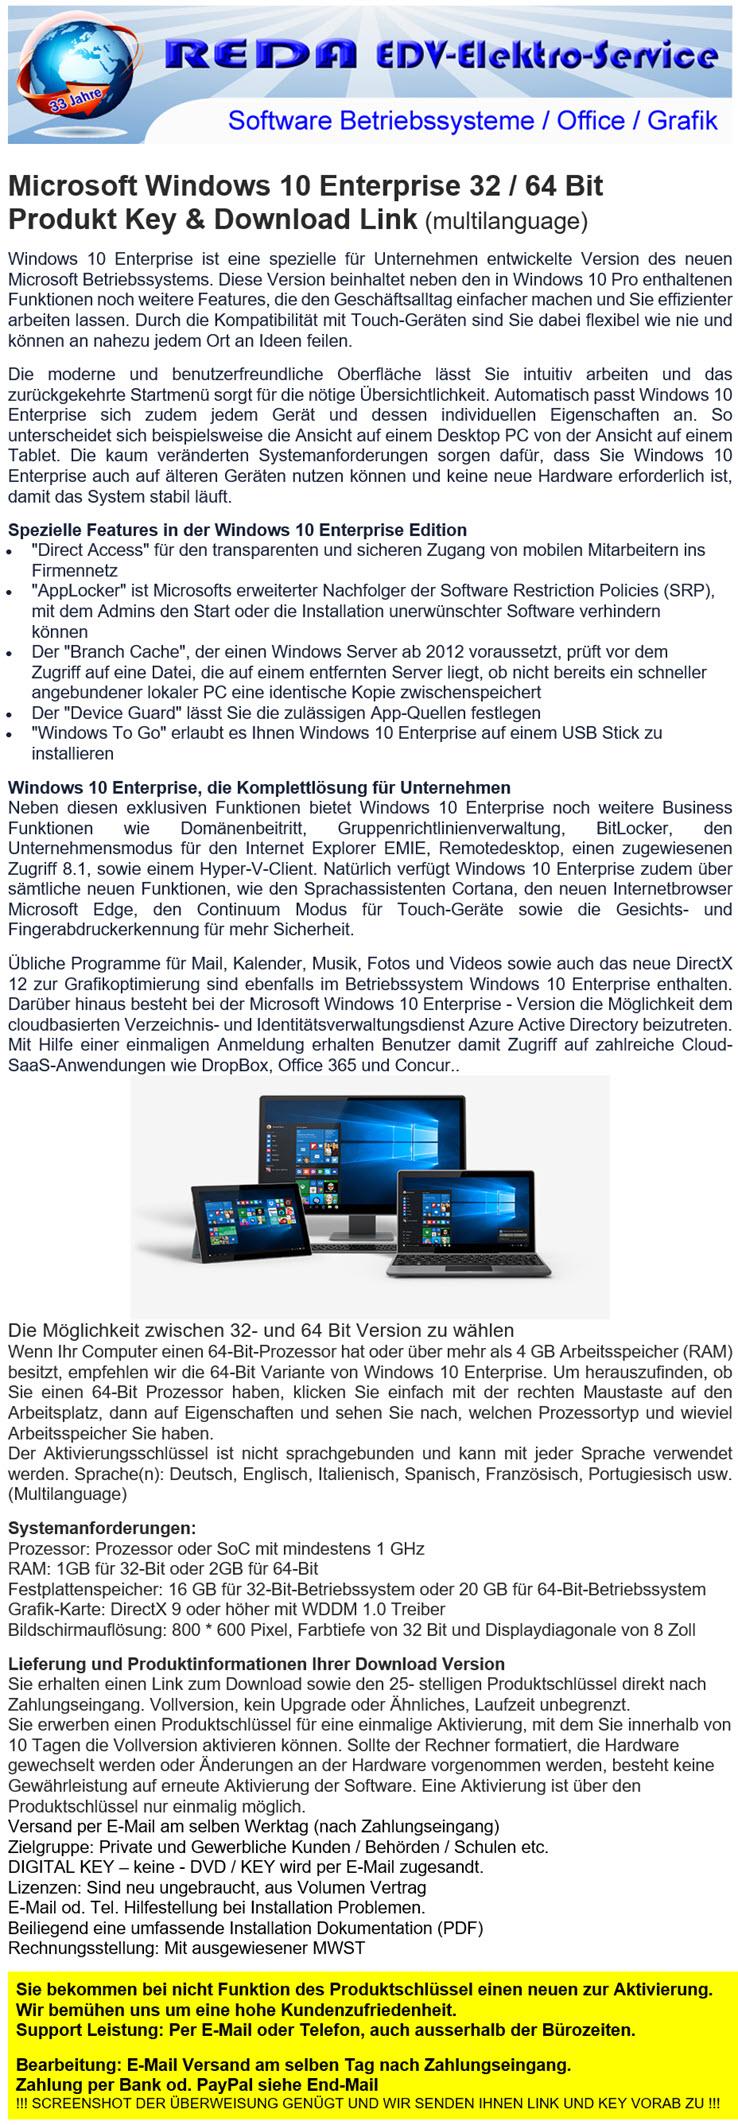 Microsoft Windows 10 Enterprise (Multi) kaufen auf ricardo ch